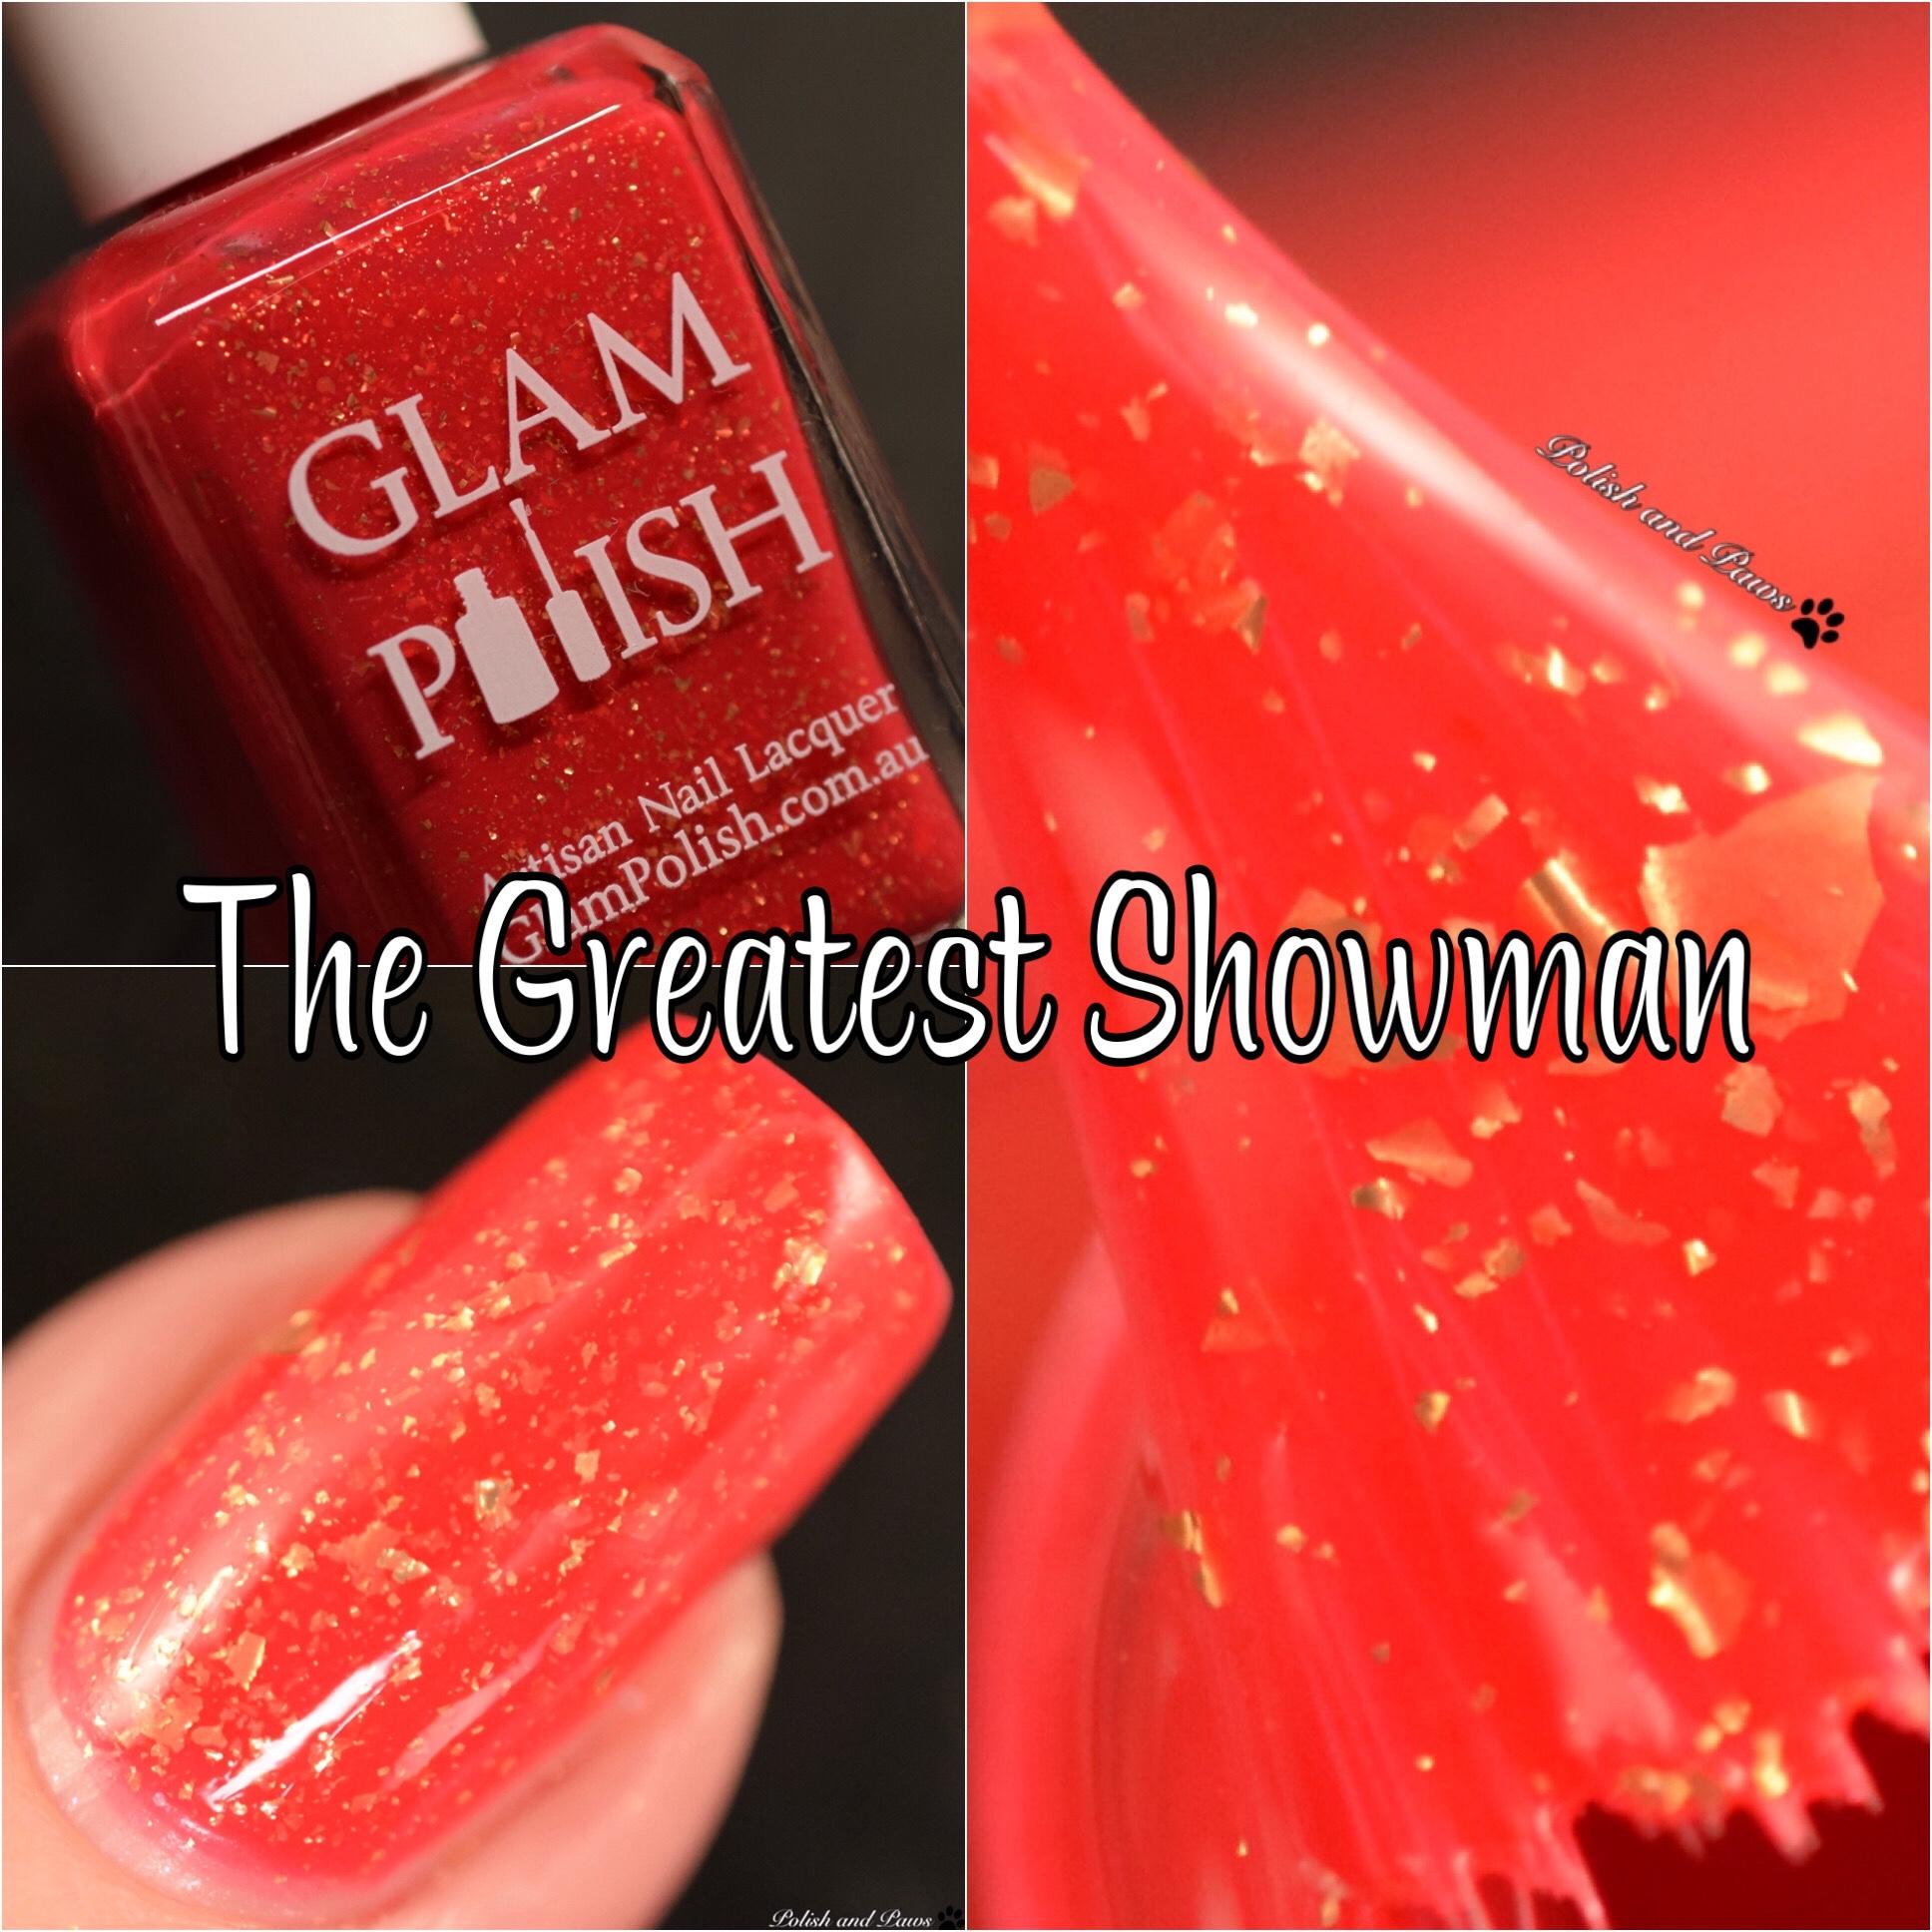 Glam Polish The Greatest Showman